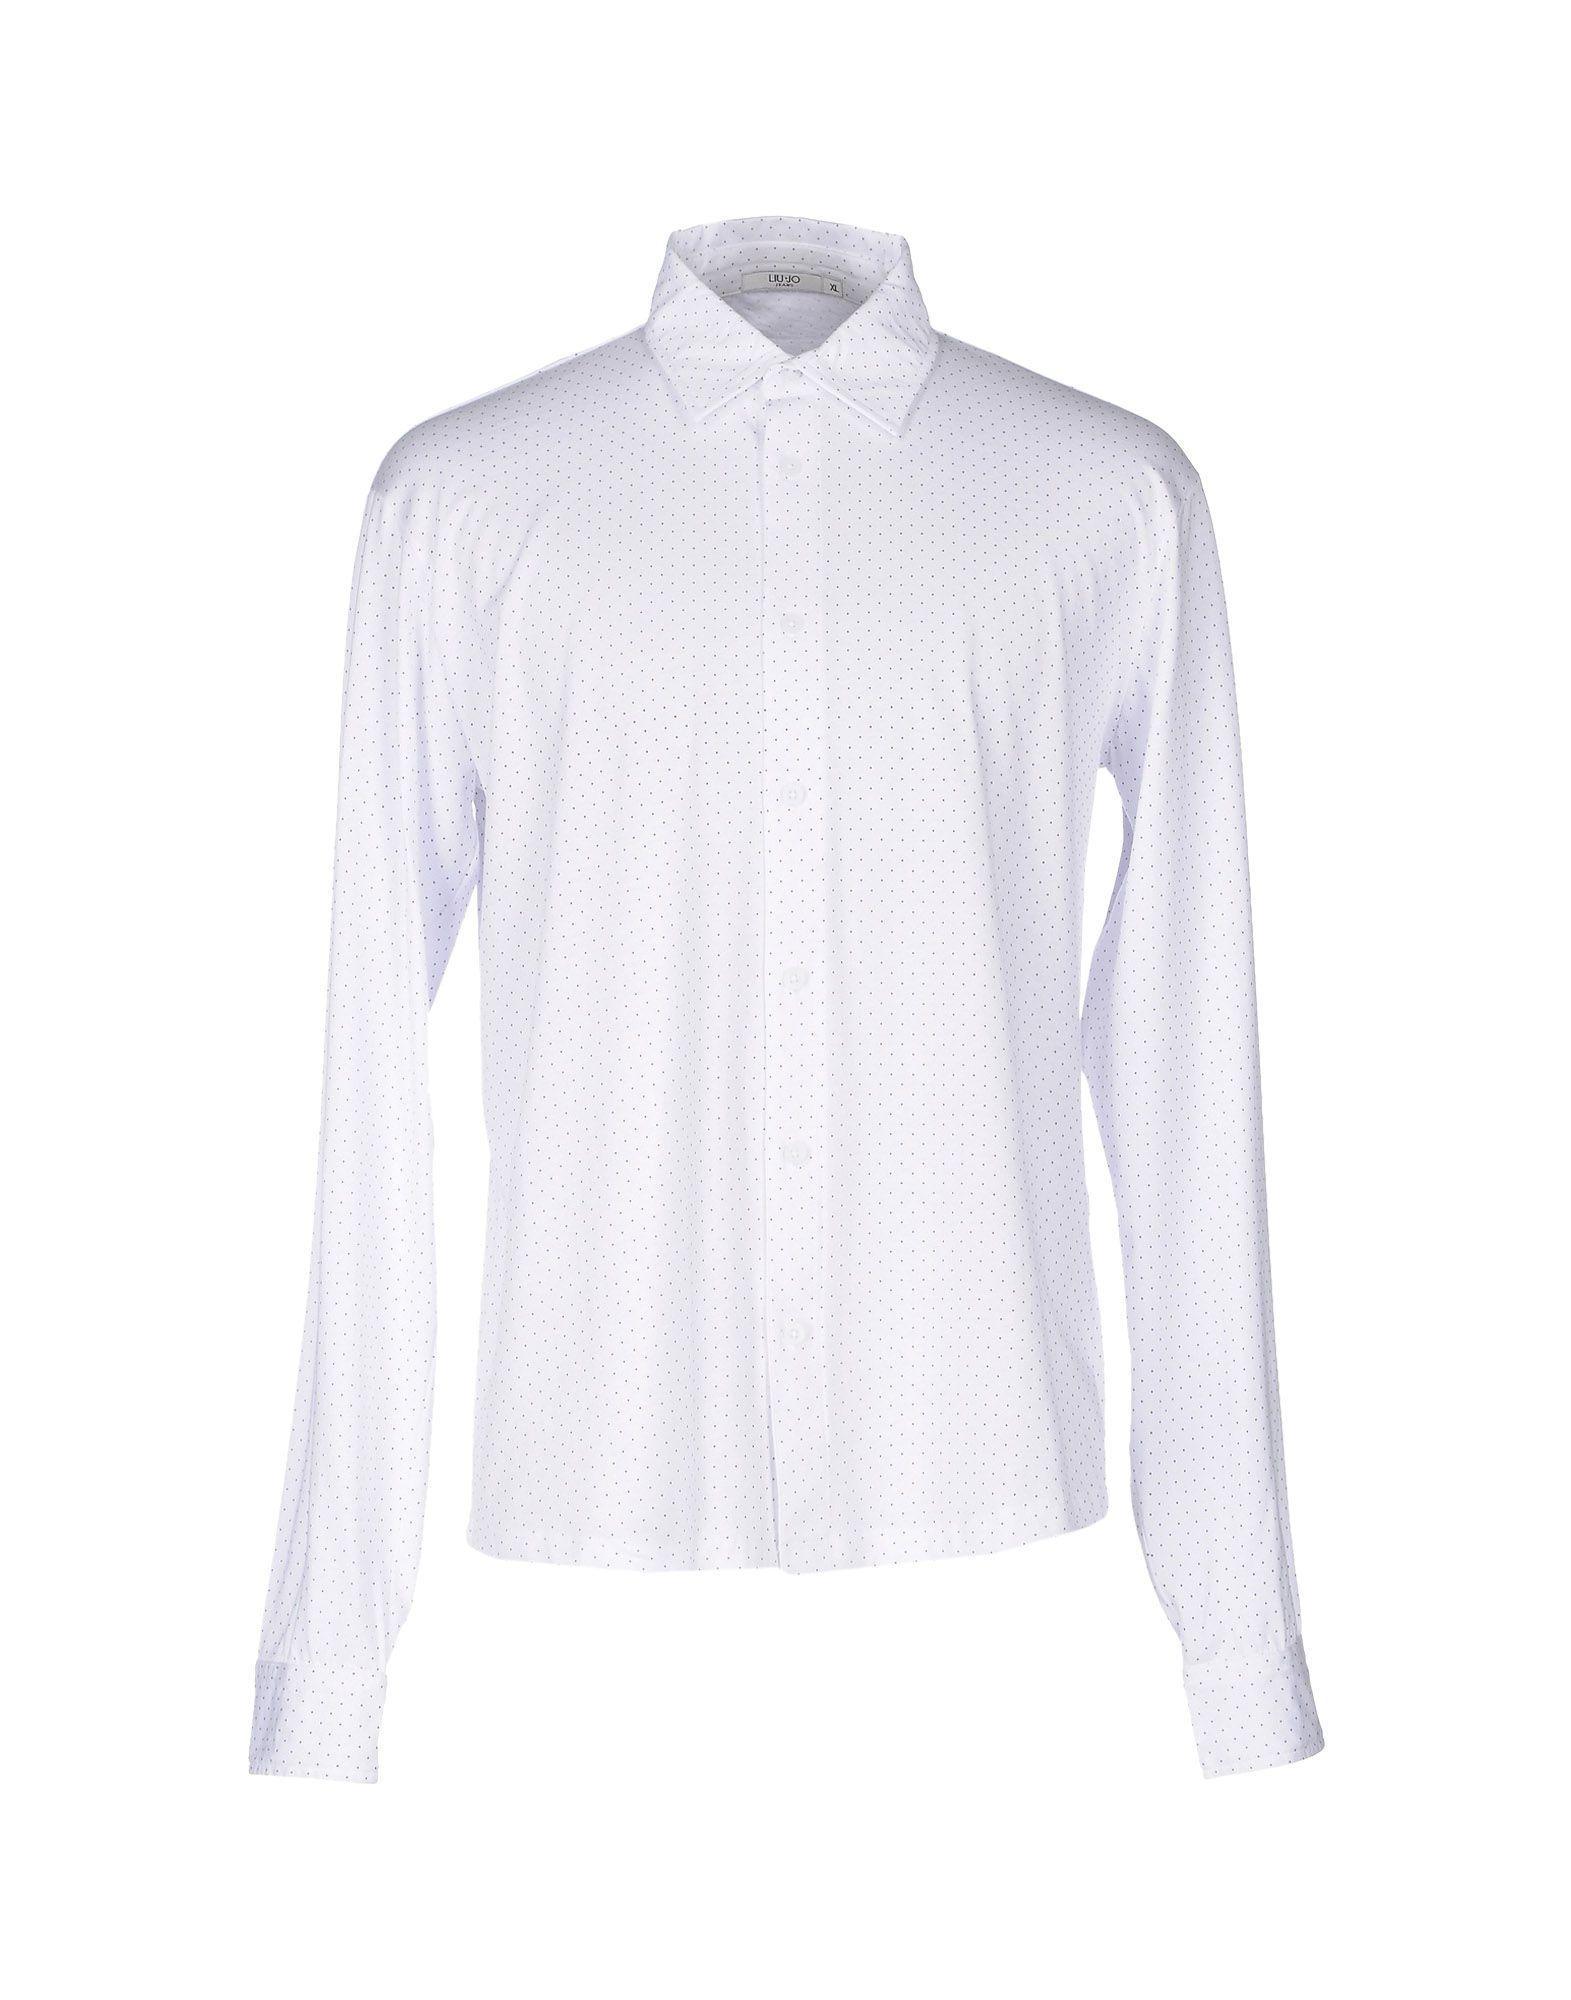 Liu •jo Patterned Shirt In White